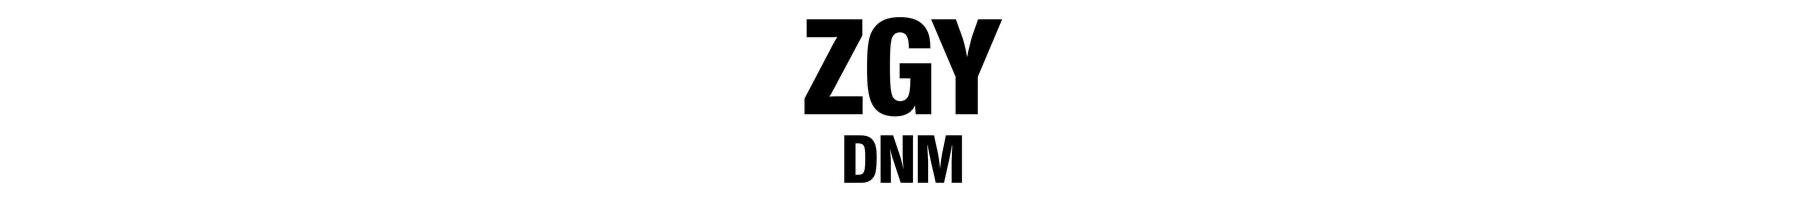 DrJays.com - ZGY Denim